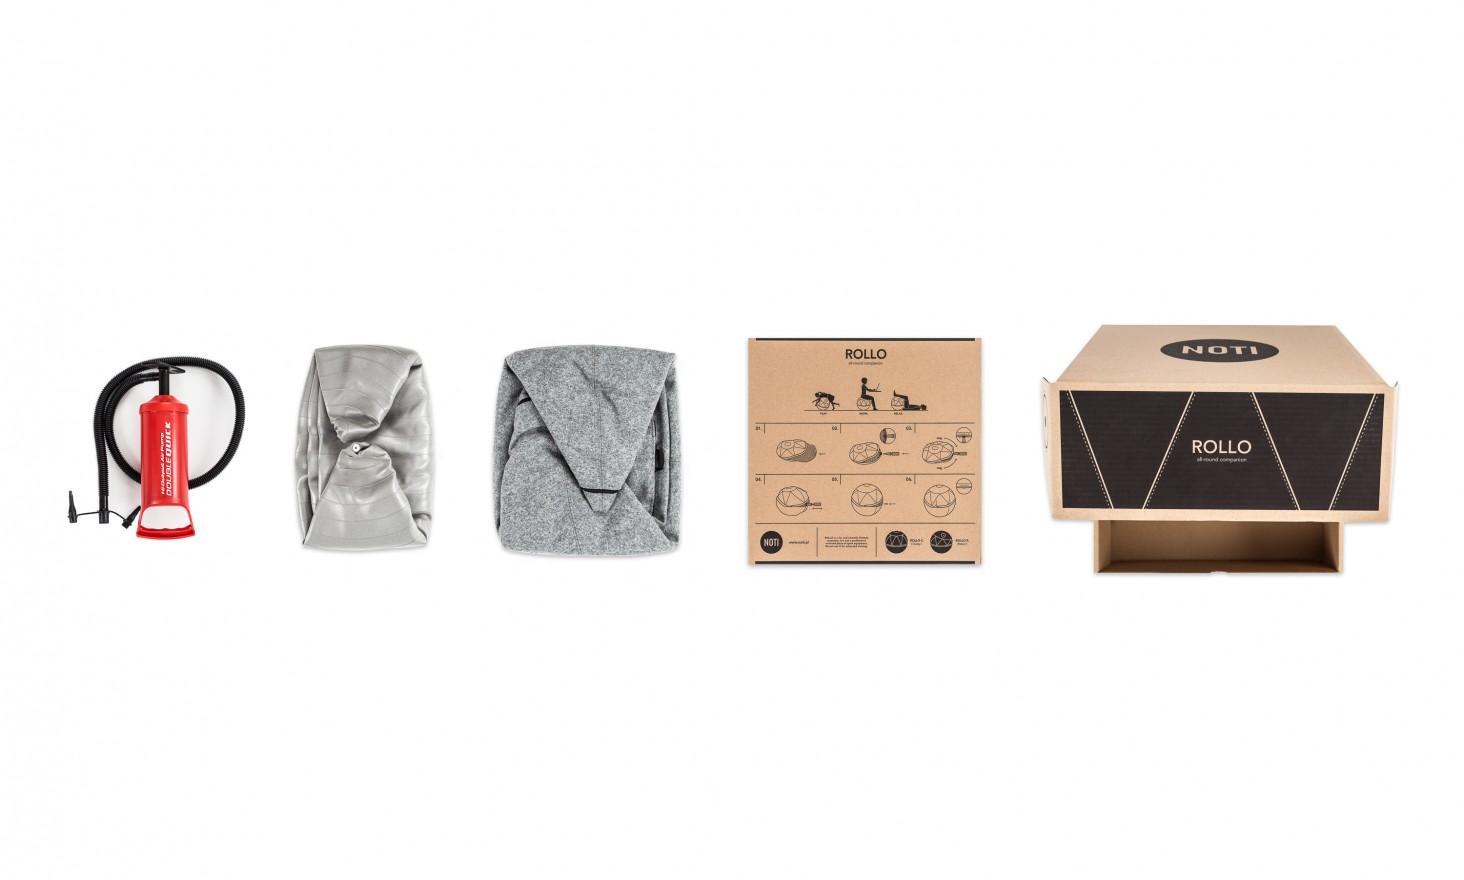 ROLLO.packshot set